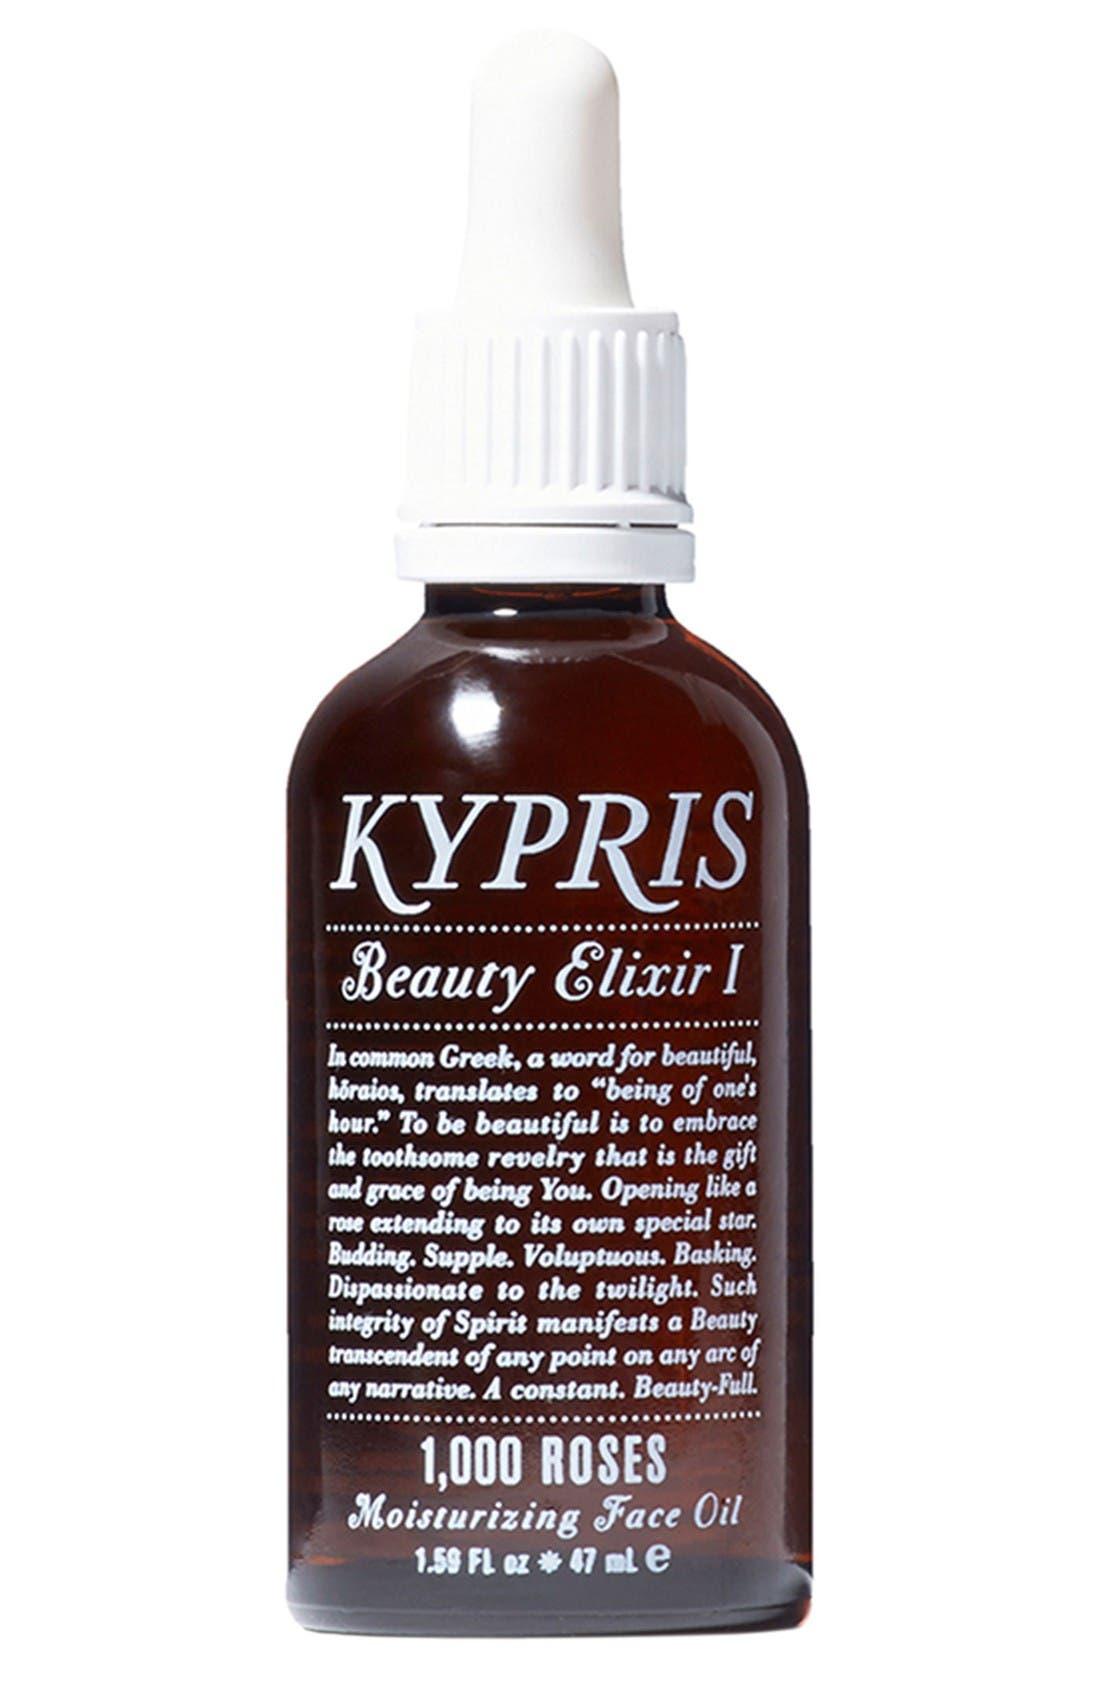 KYPRIS BEAUTY Beauty Elixir I: 1000 Roses